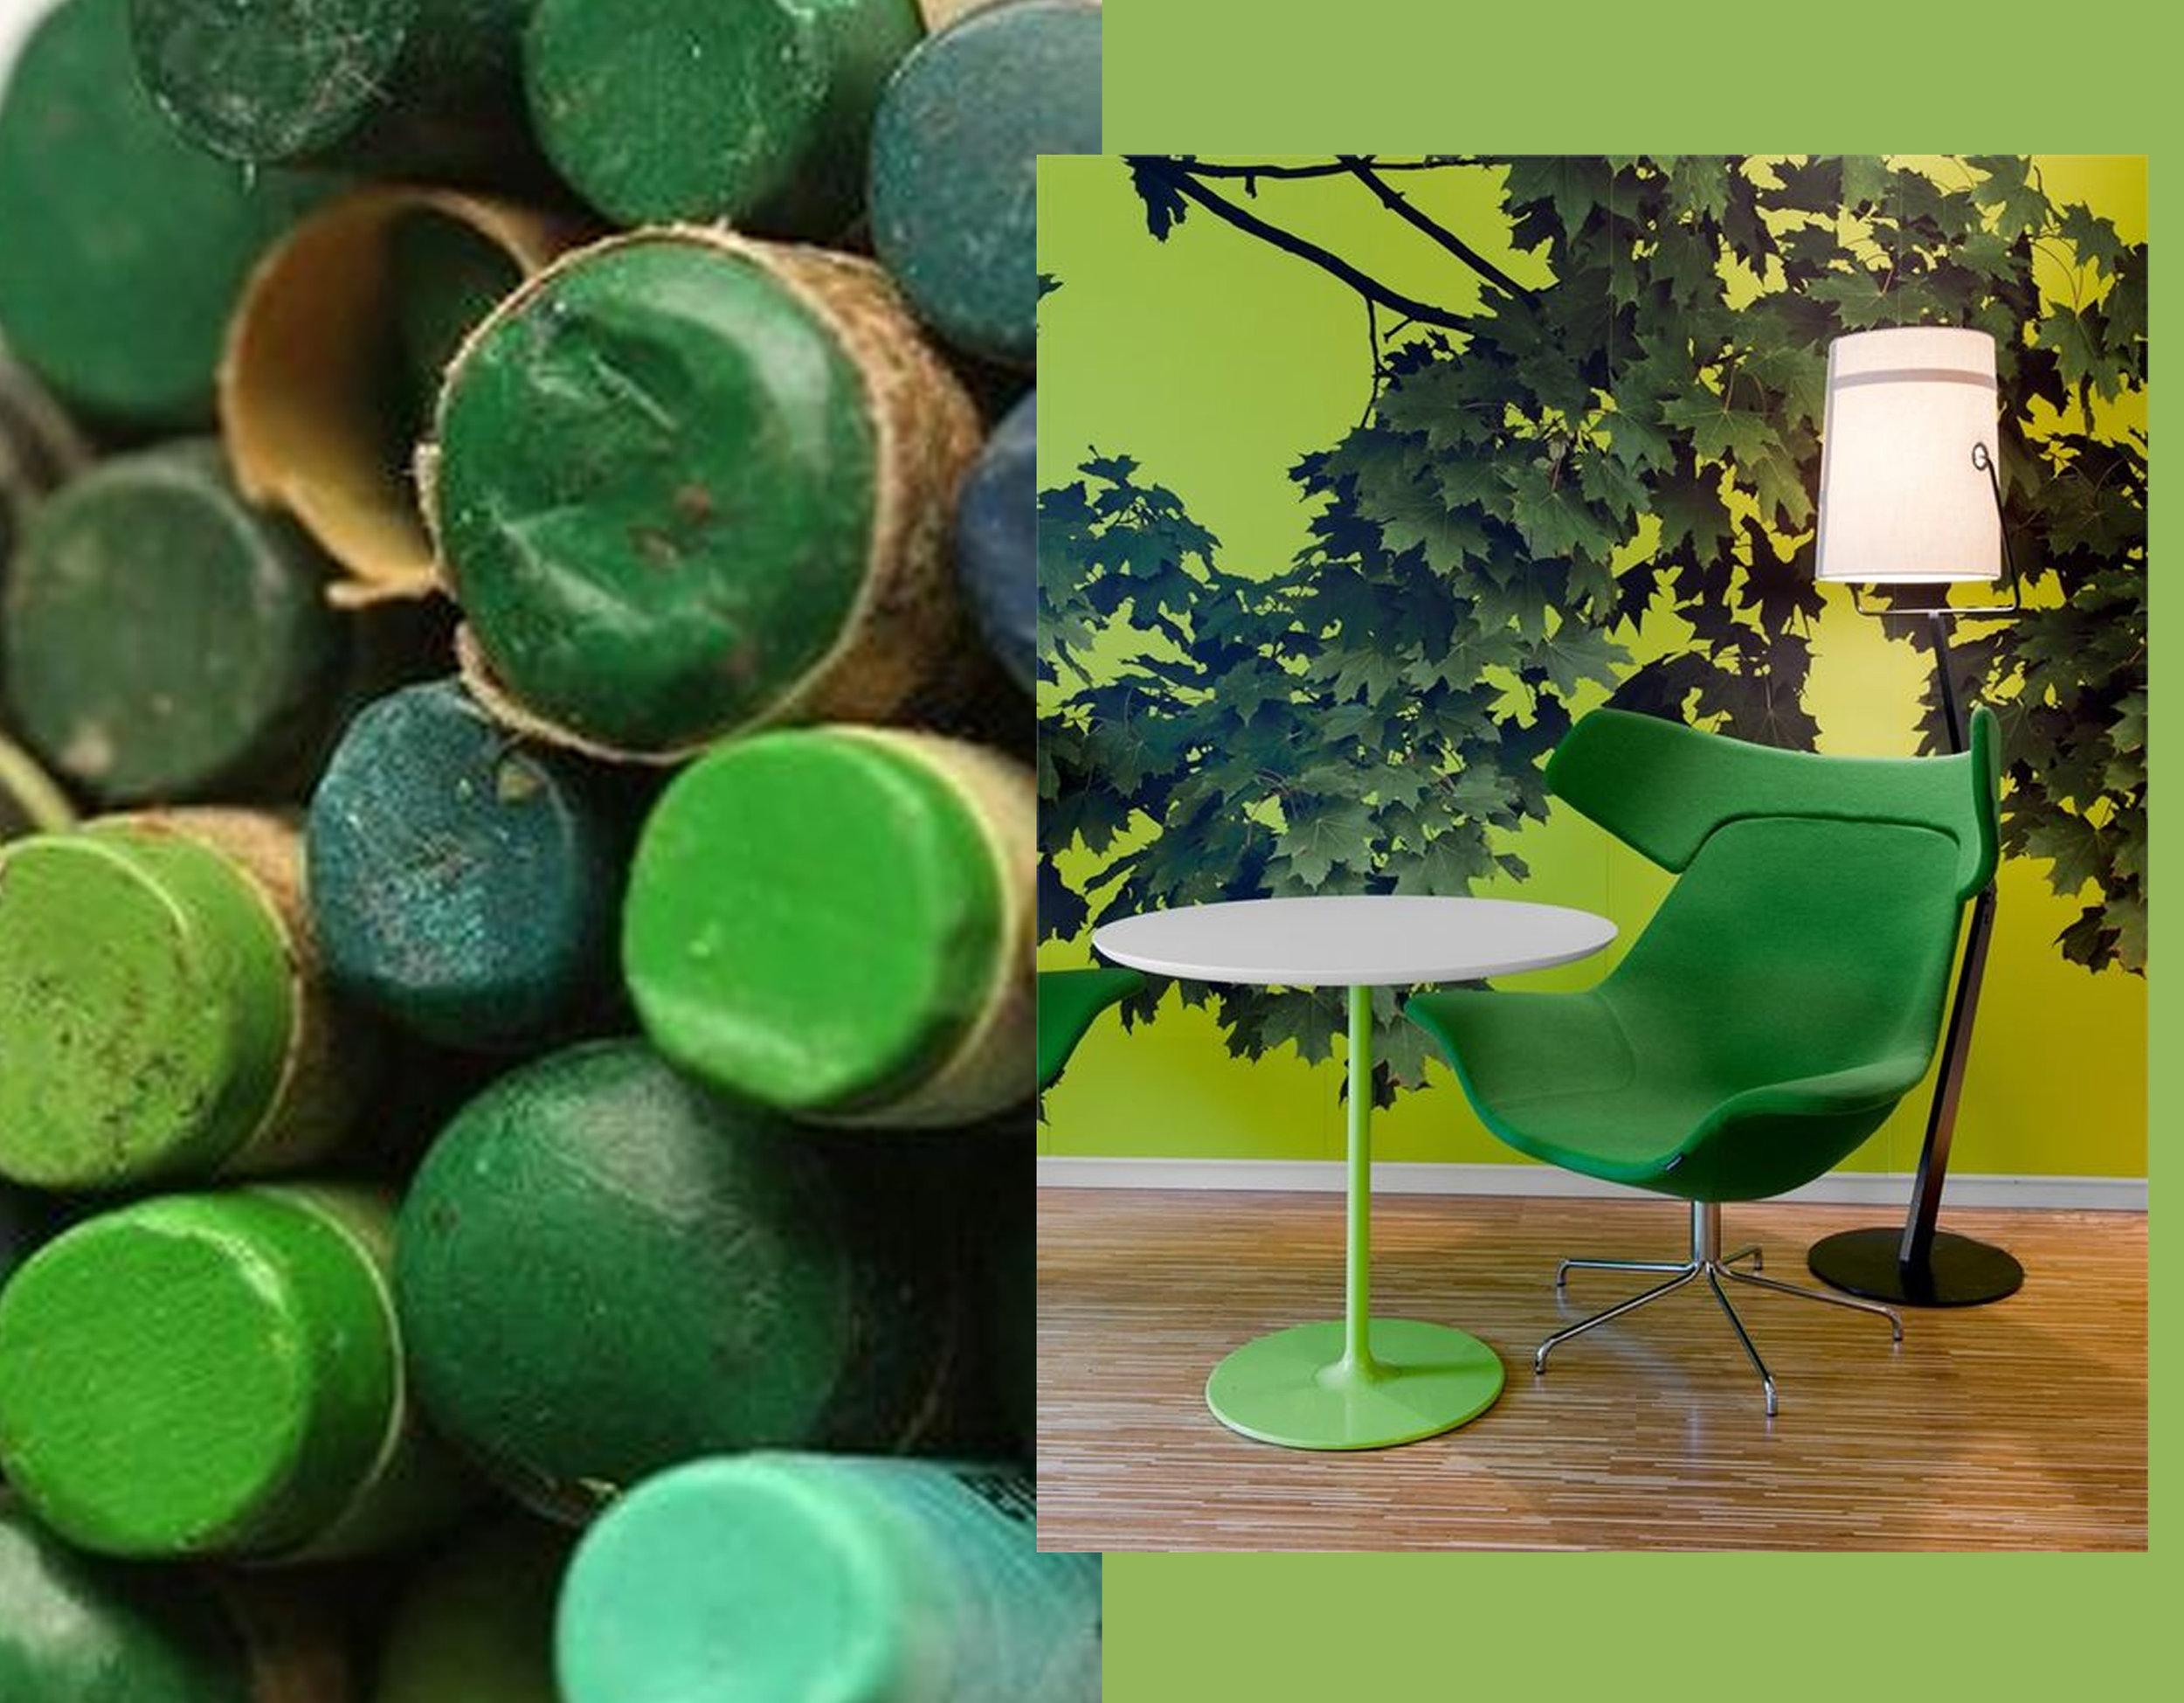 green wax crayons  Pinterest  - interior image via  Archilovers